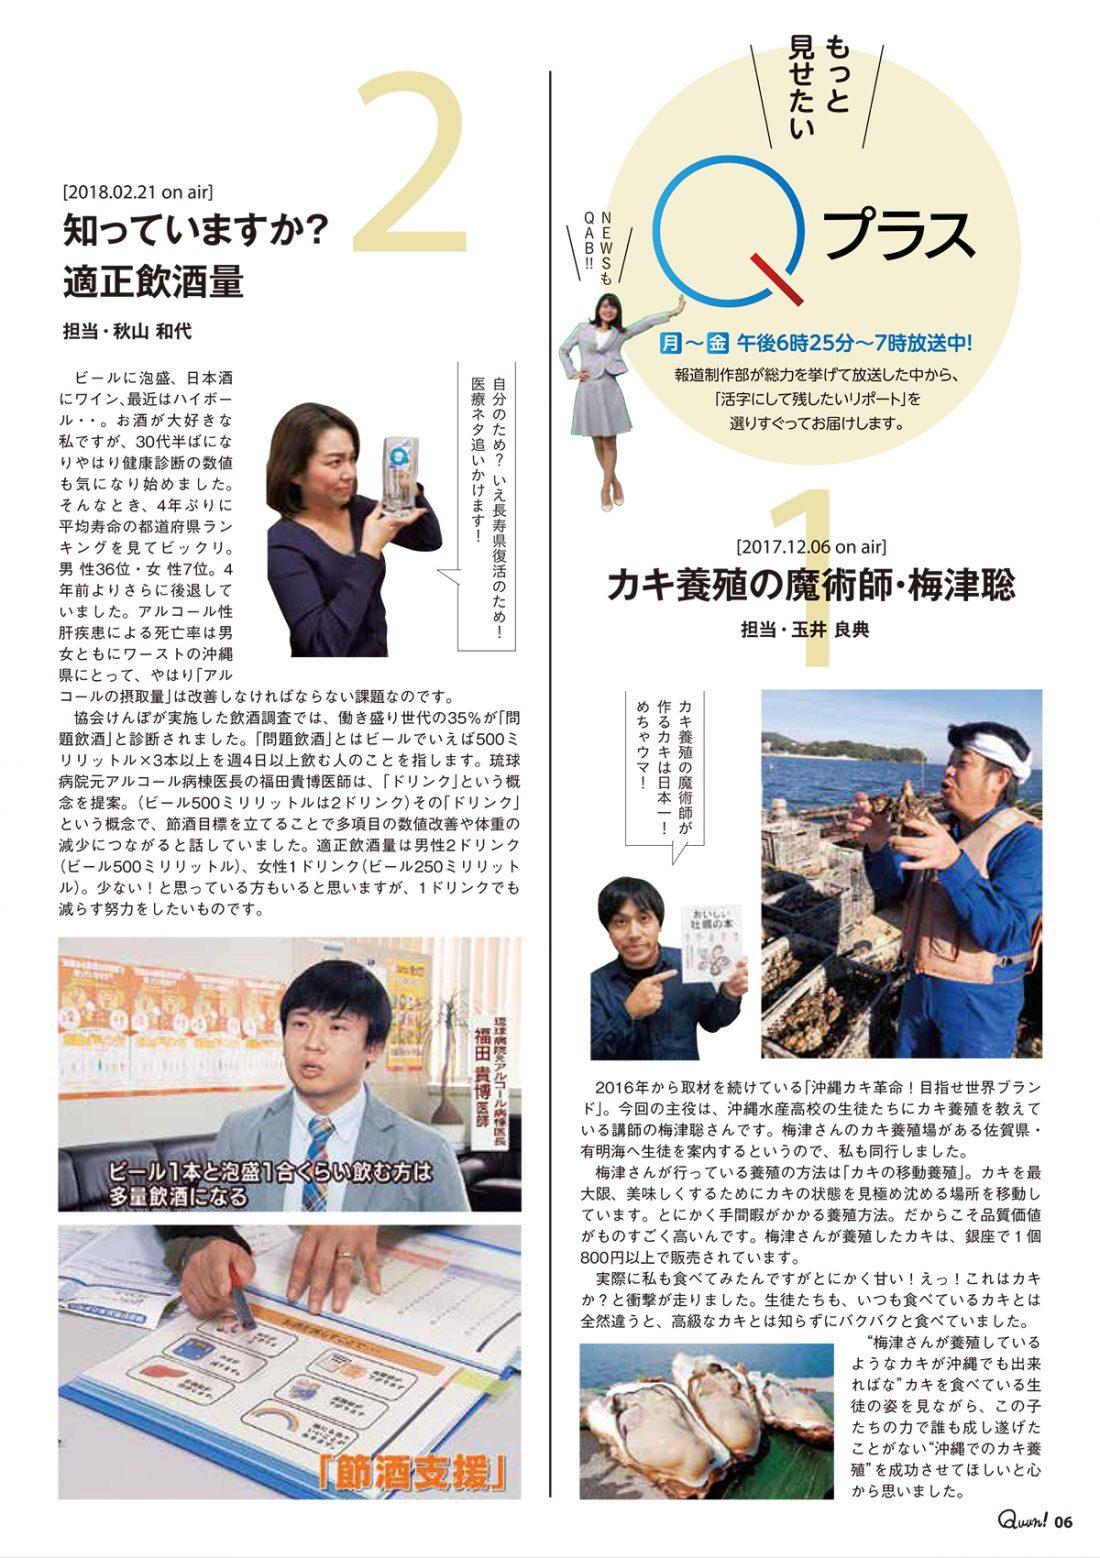 http://www.qab.co.jp/qgoro/wp-content/uploads/quun_0908-1100x1558.jpg